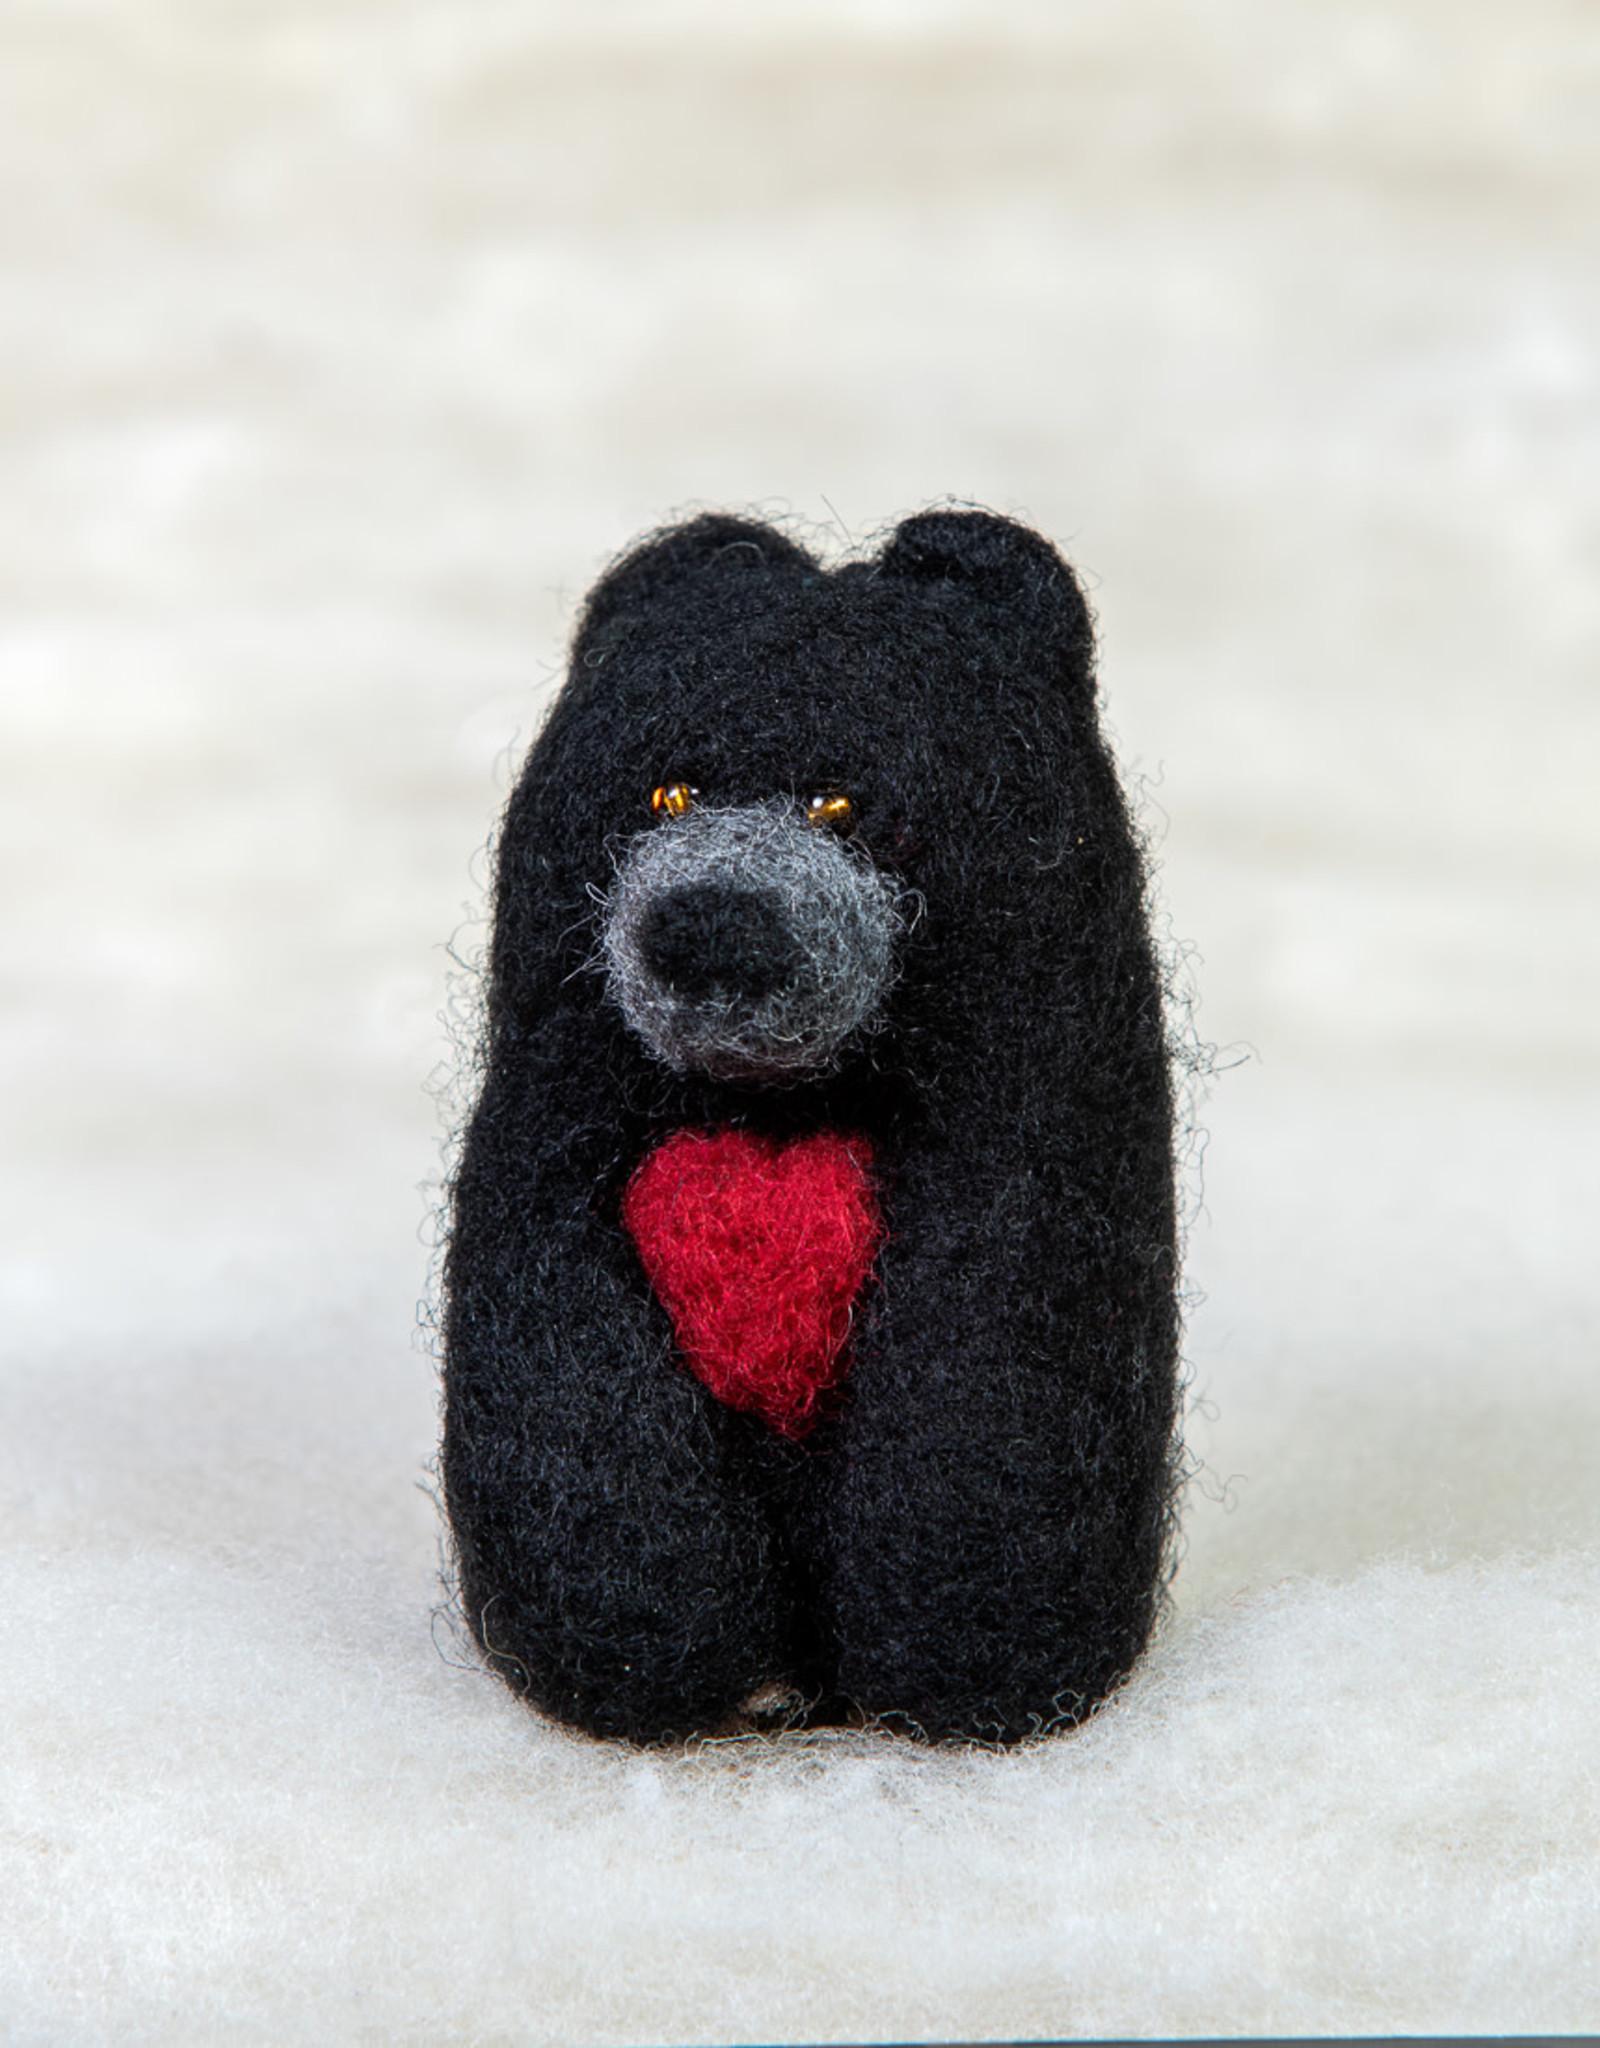 Spectacled Bear Black Bear with Heart